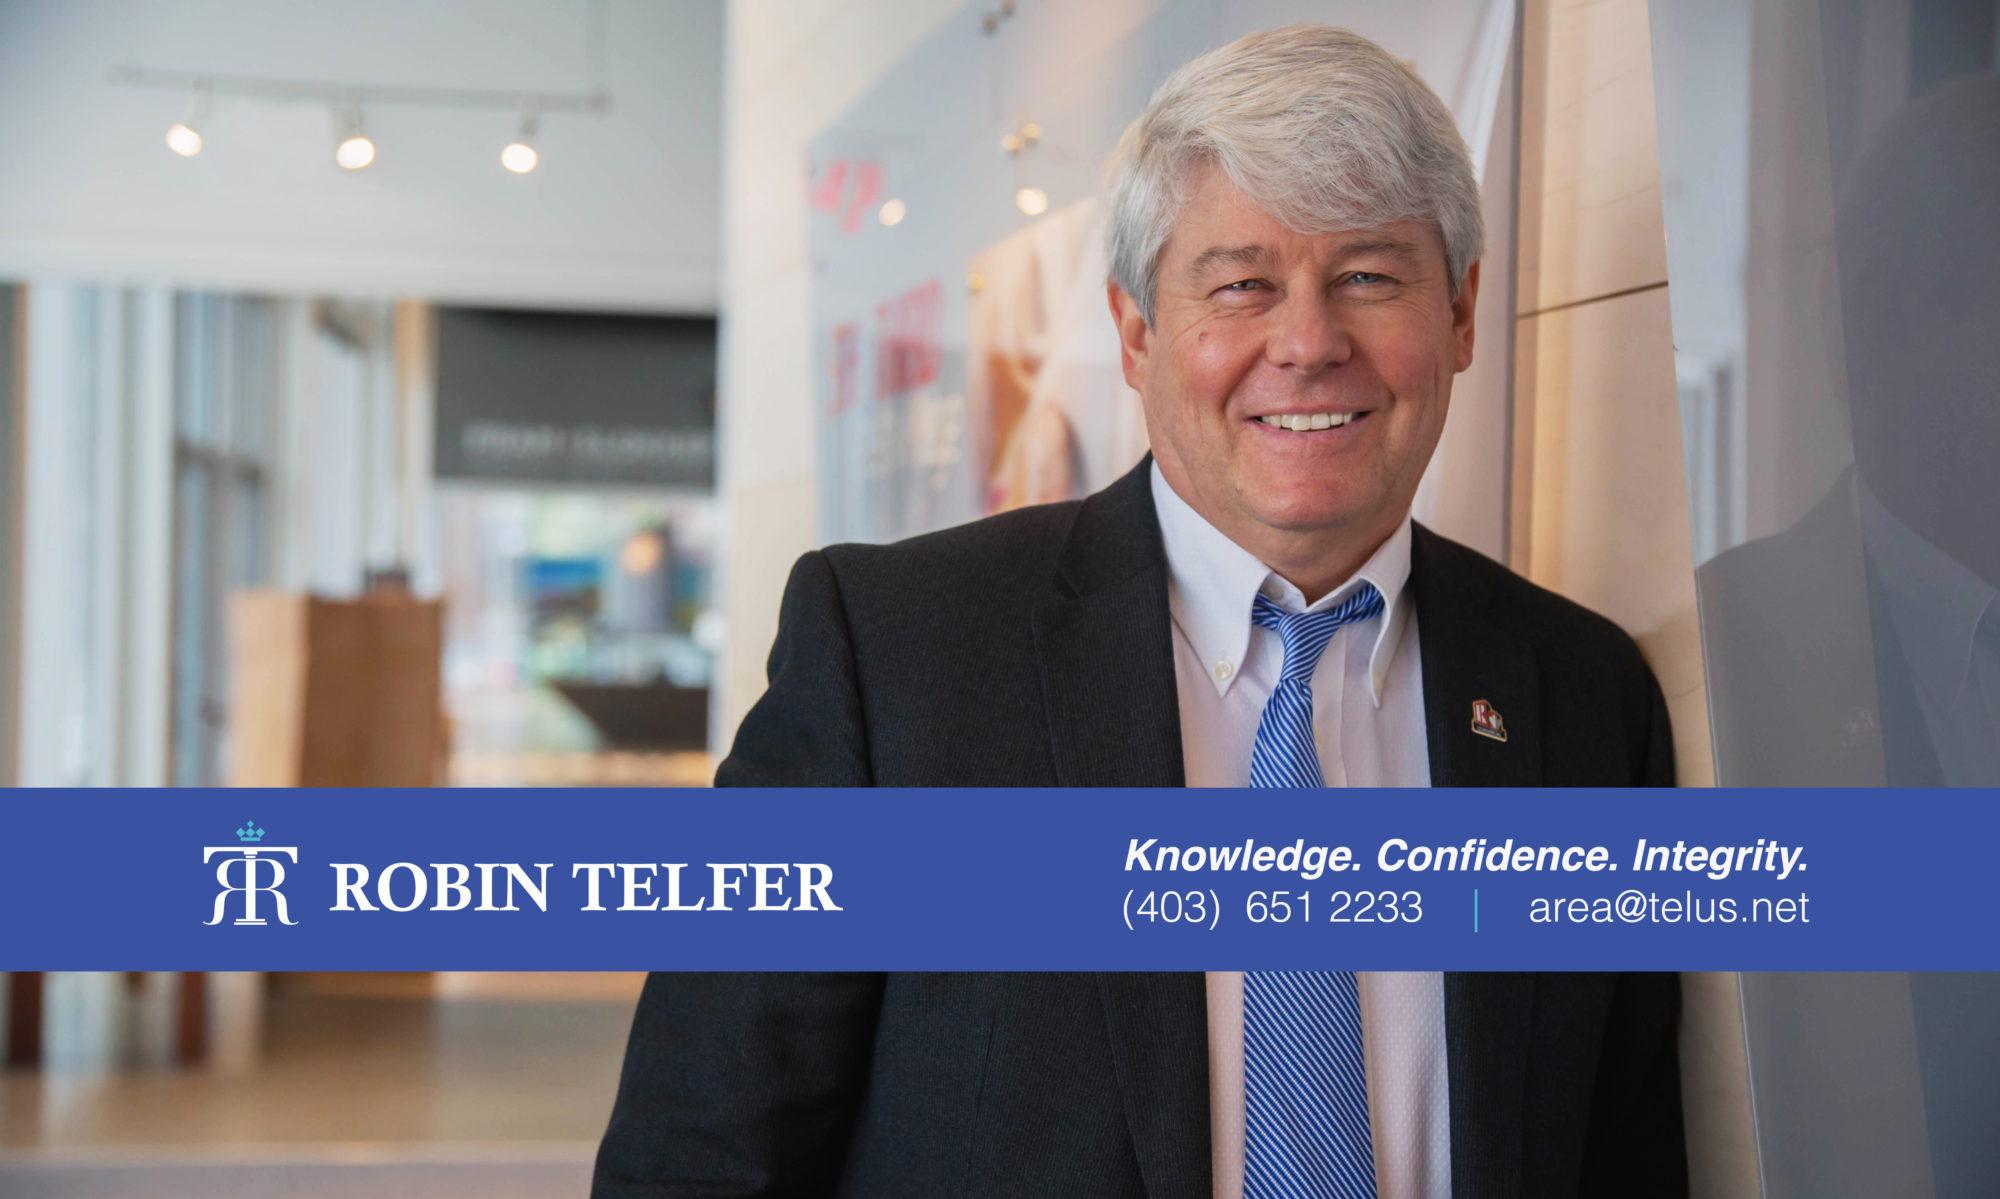 Robin Telfer